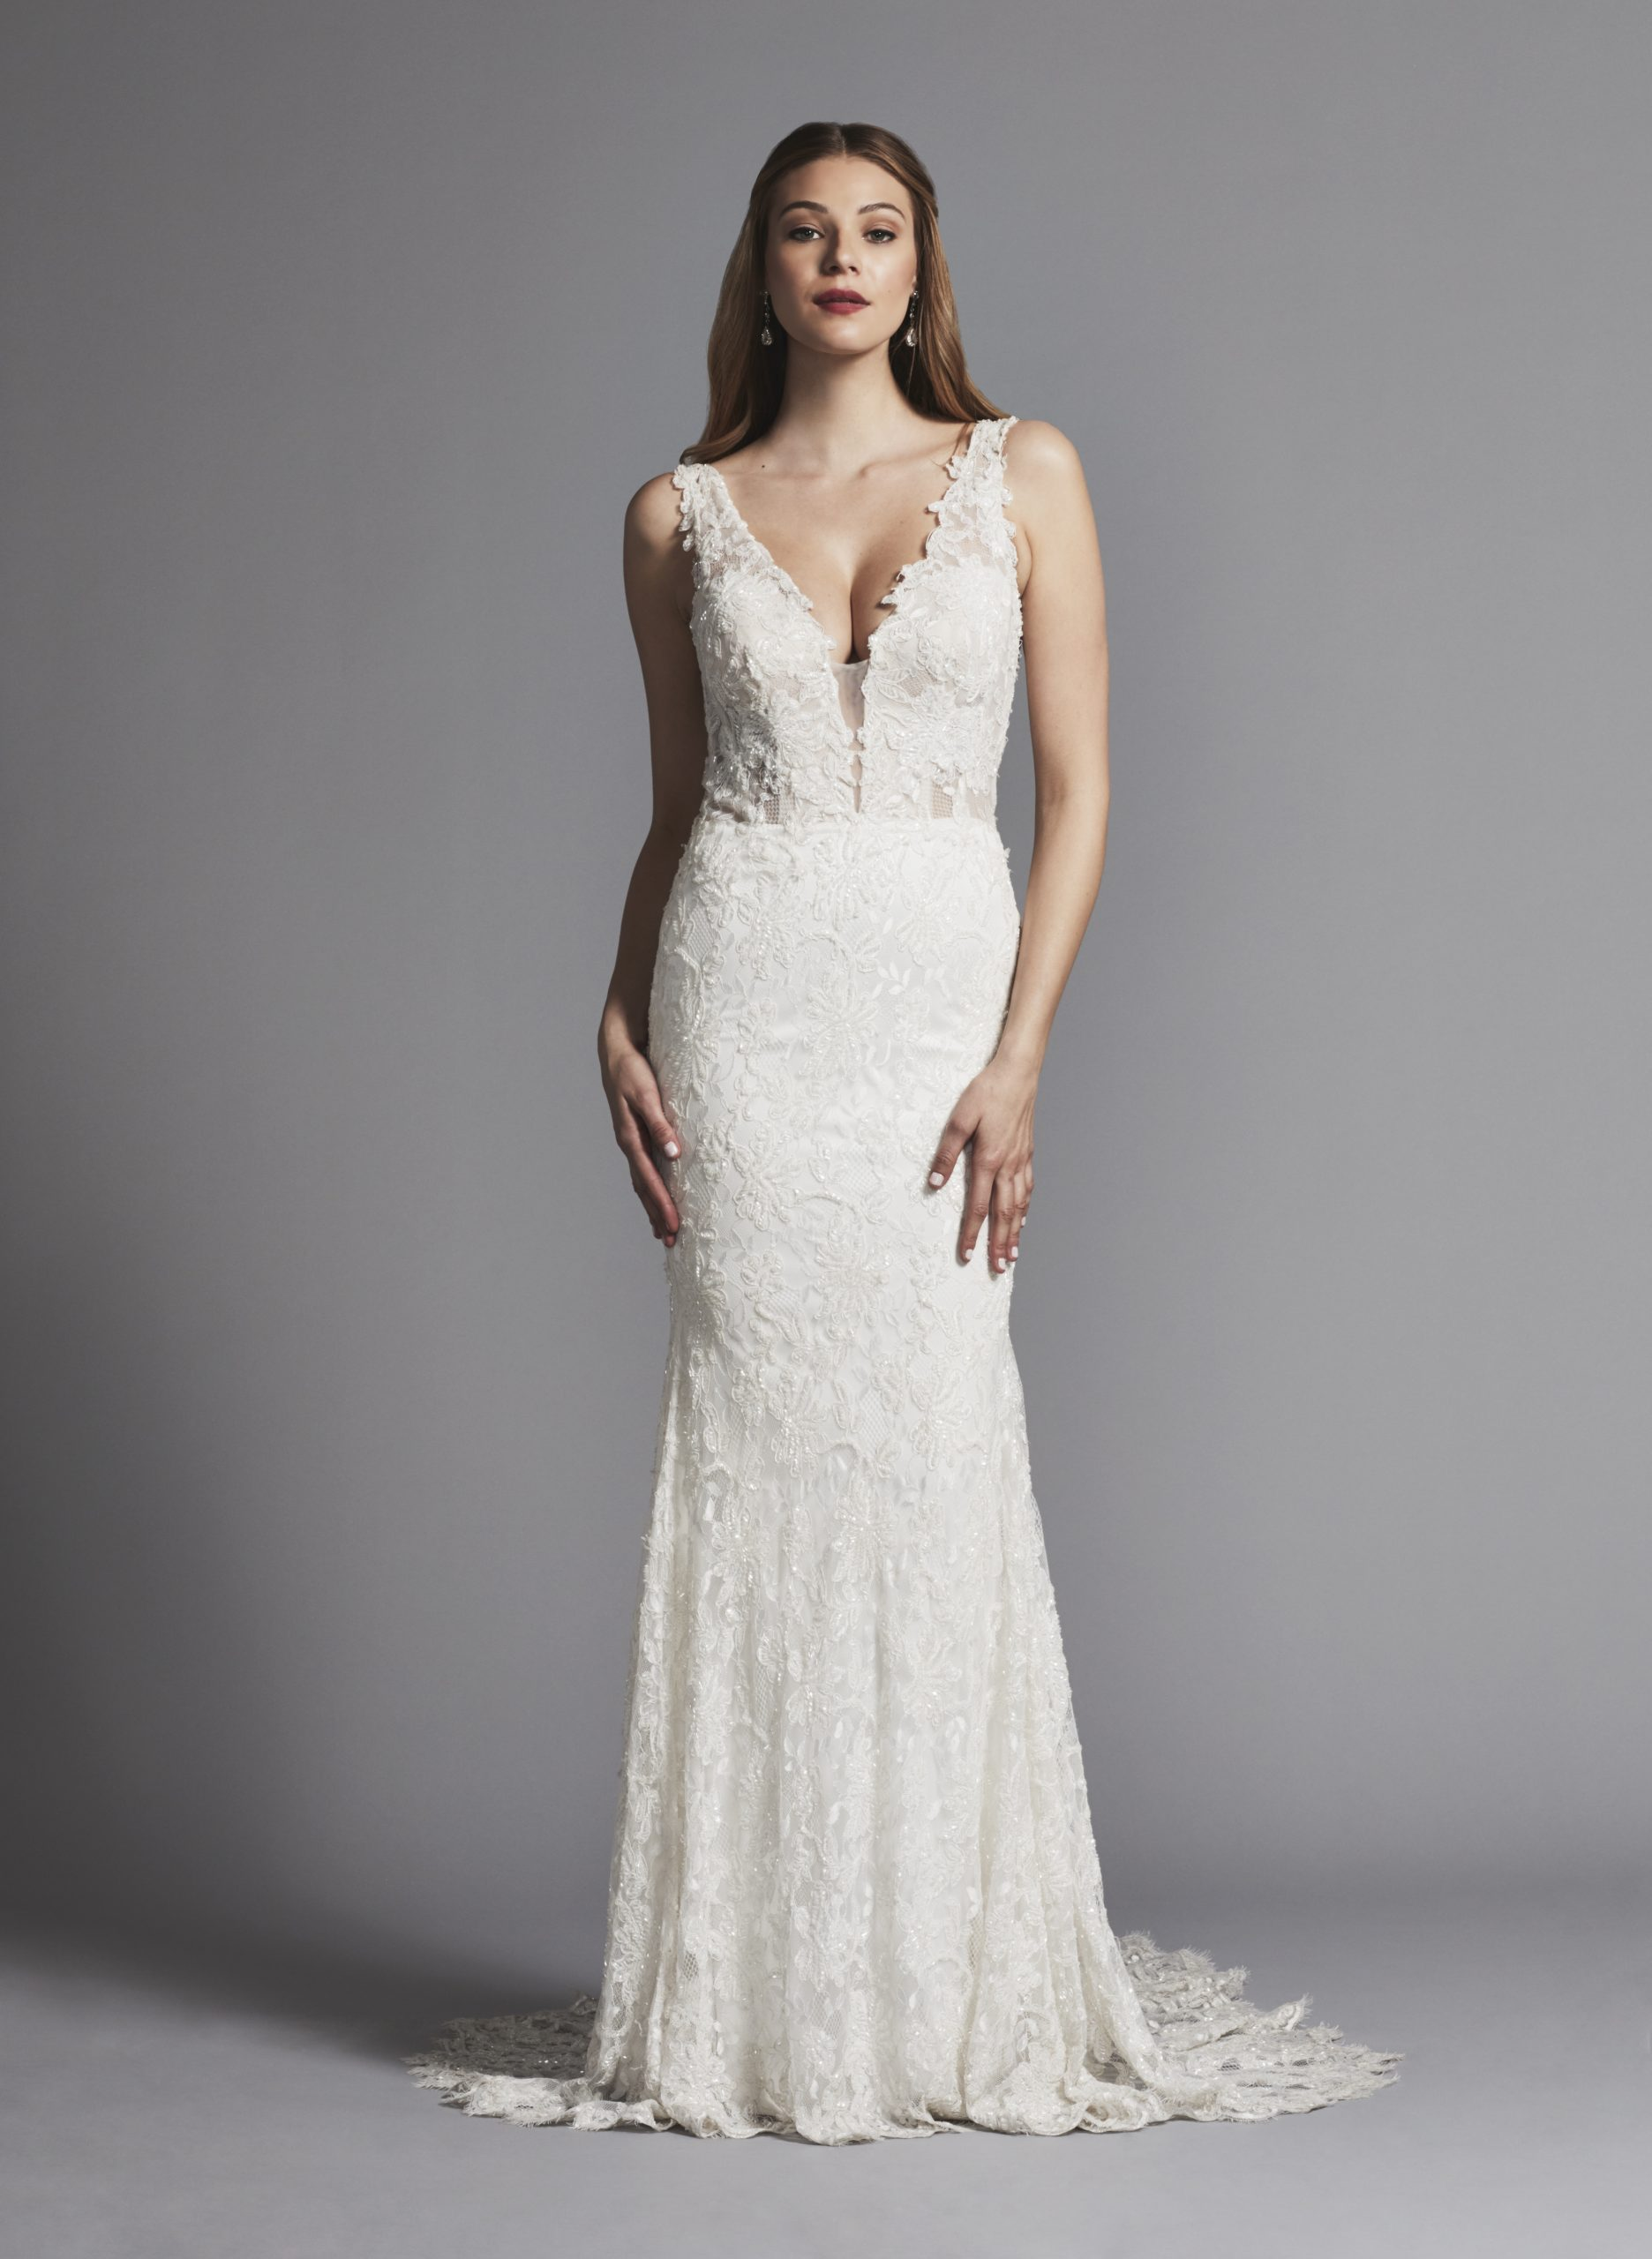 Sleeveless Lace Sheath Wedding Dress